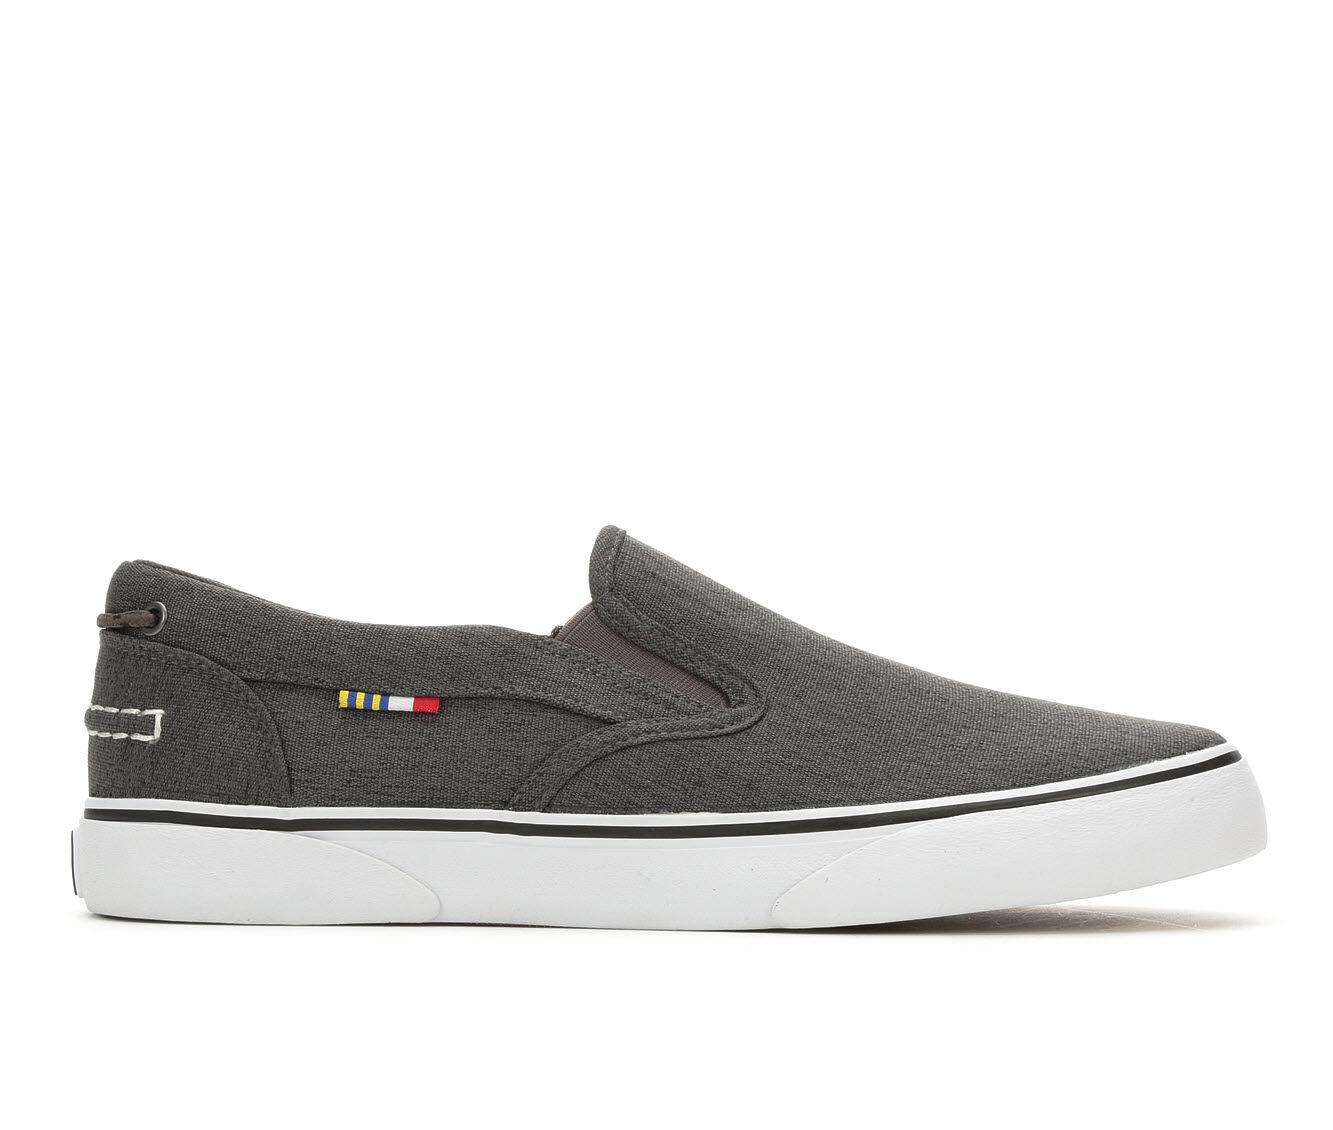 Men's Guy Harvey Pacific Casual Shoes Grey/Black